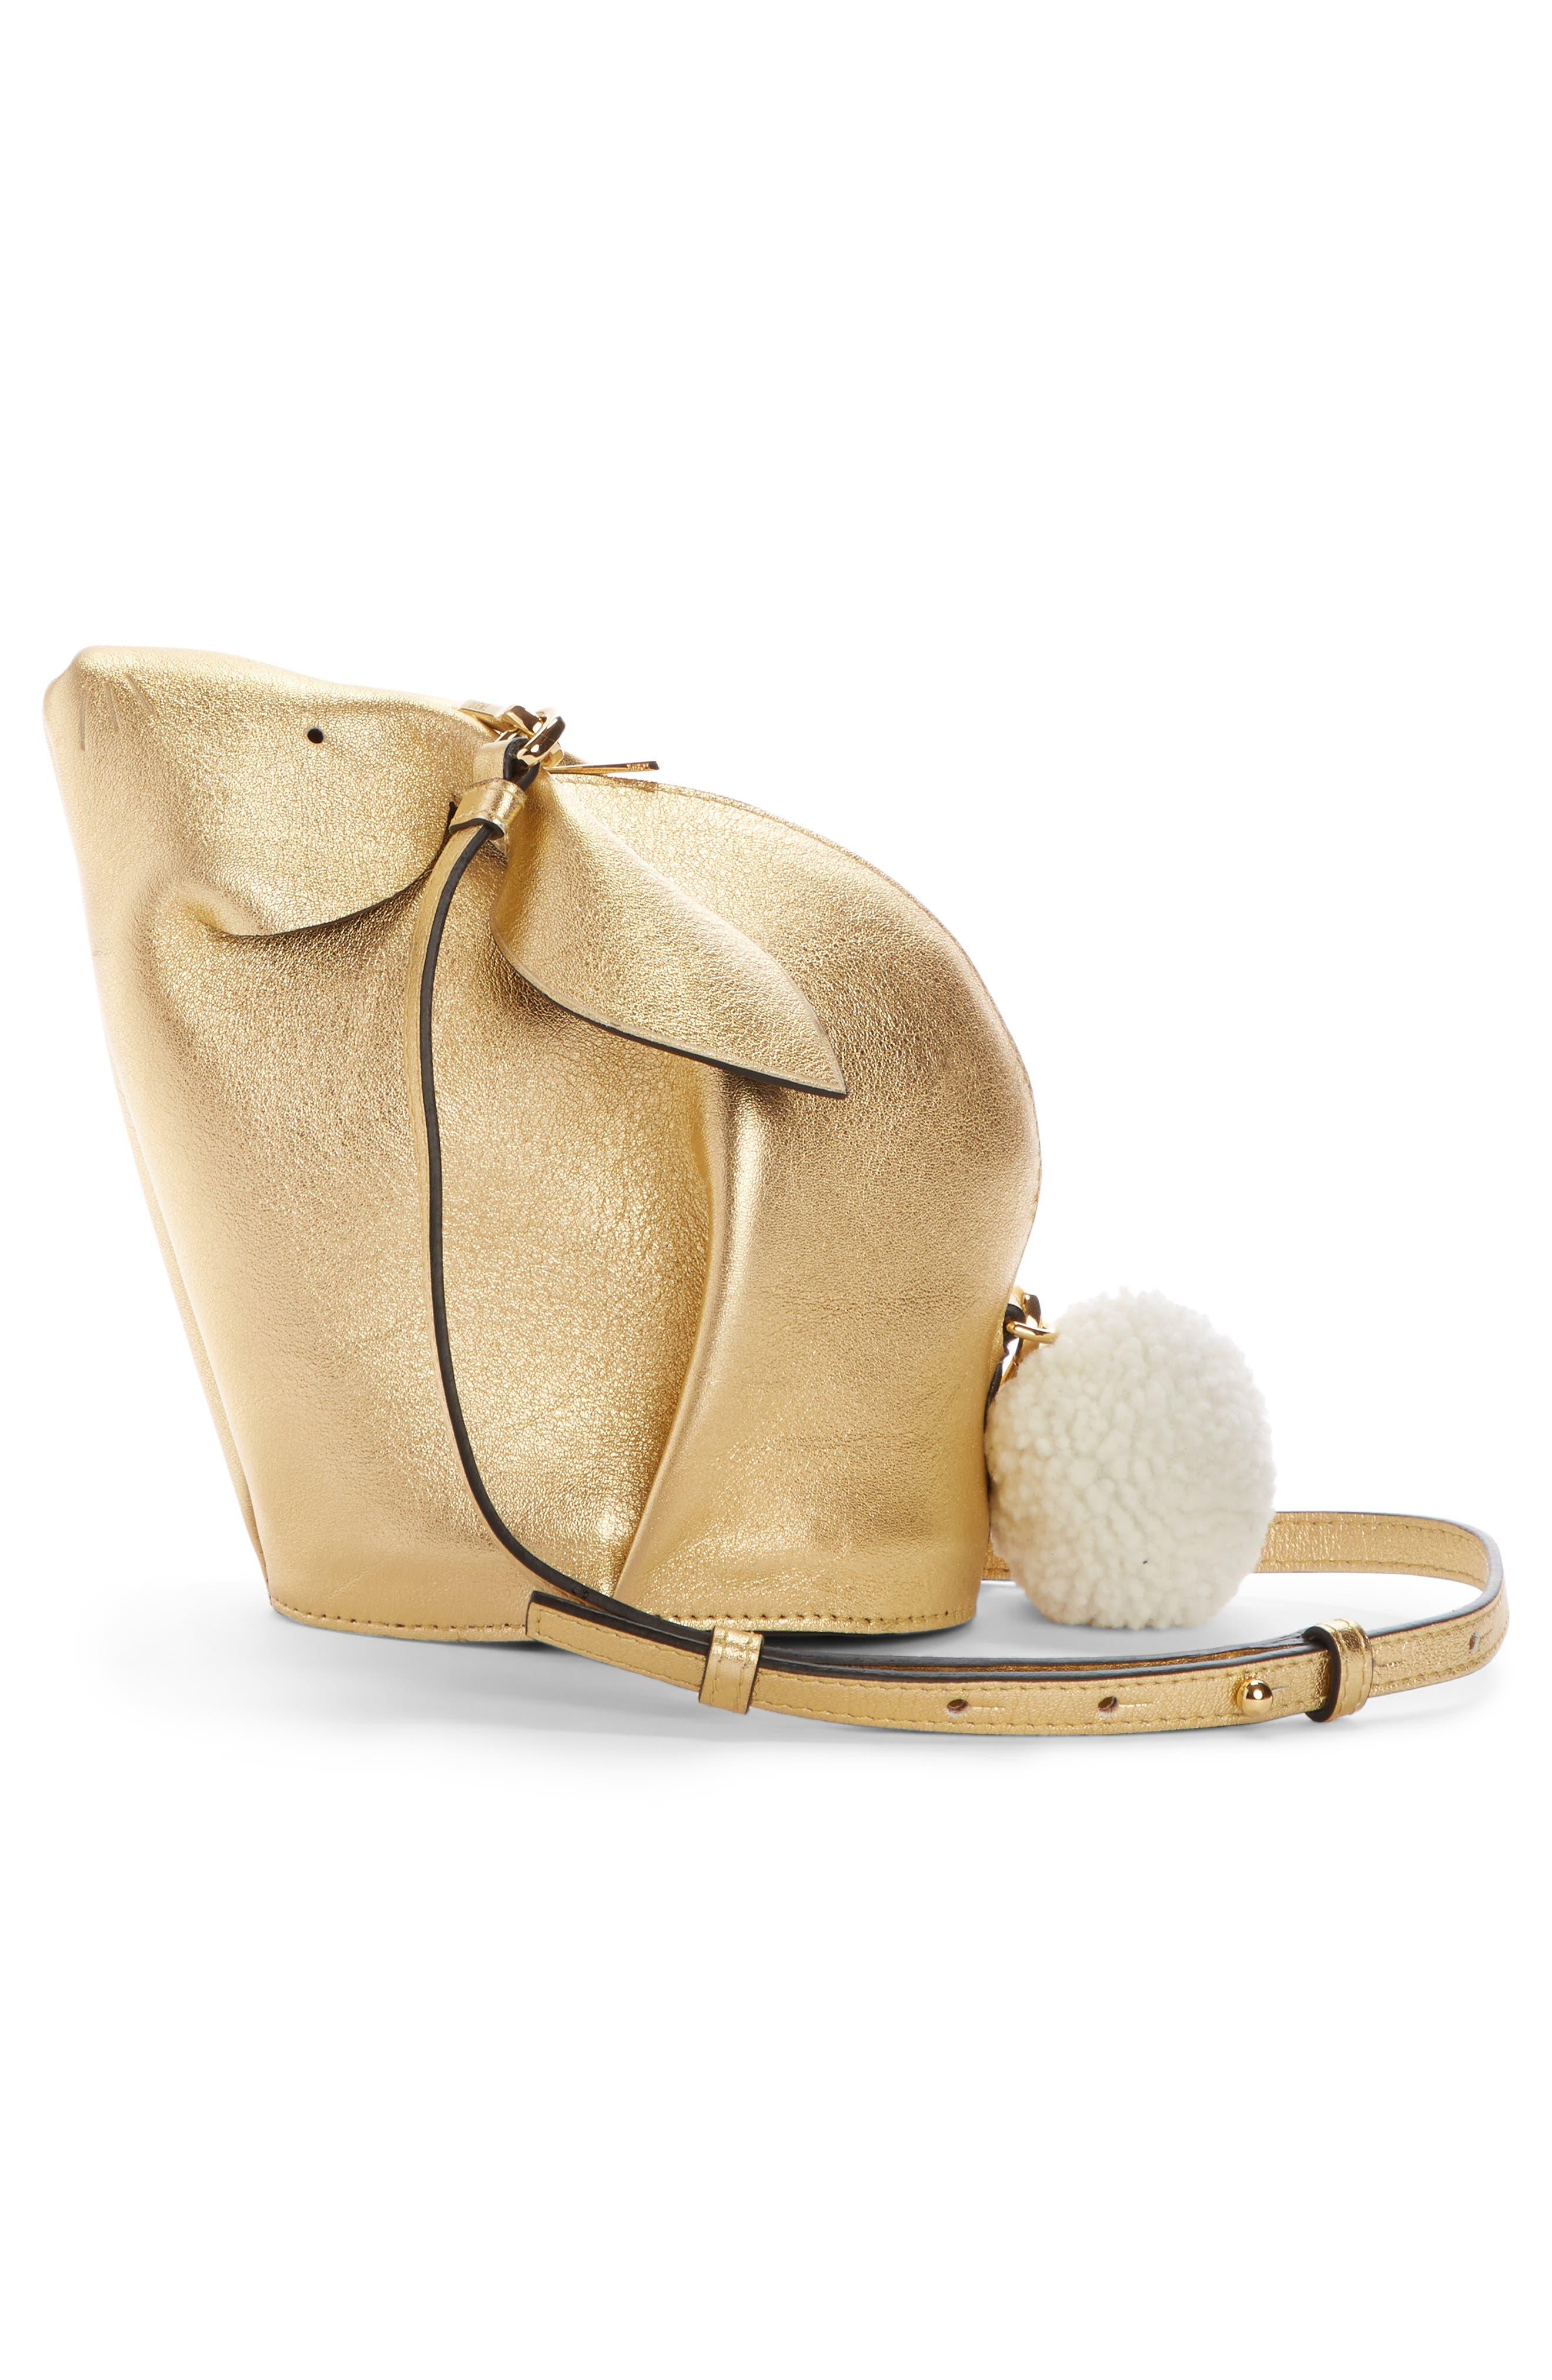 Mini Bunny Metallic Leather Crossbody Bag with Genuine Shearling Trim,                             Alternate thumbnail 2, color,                             710